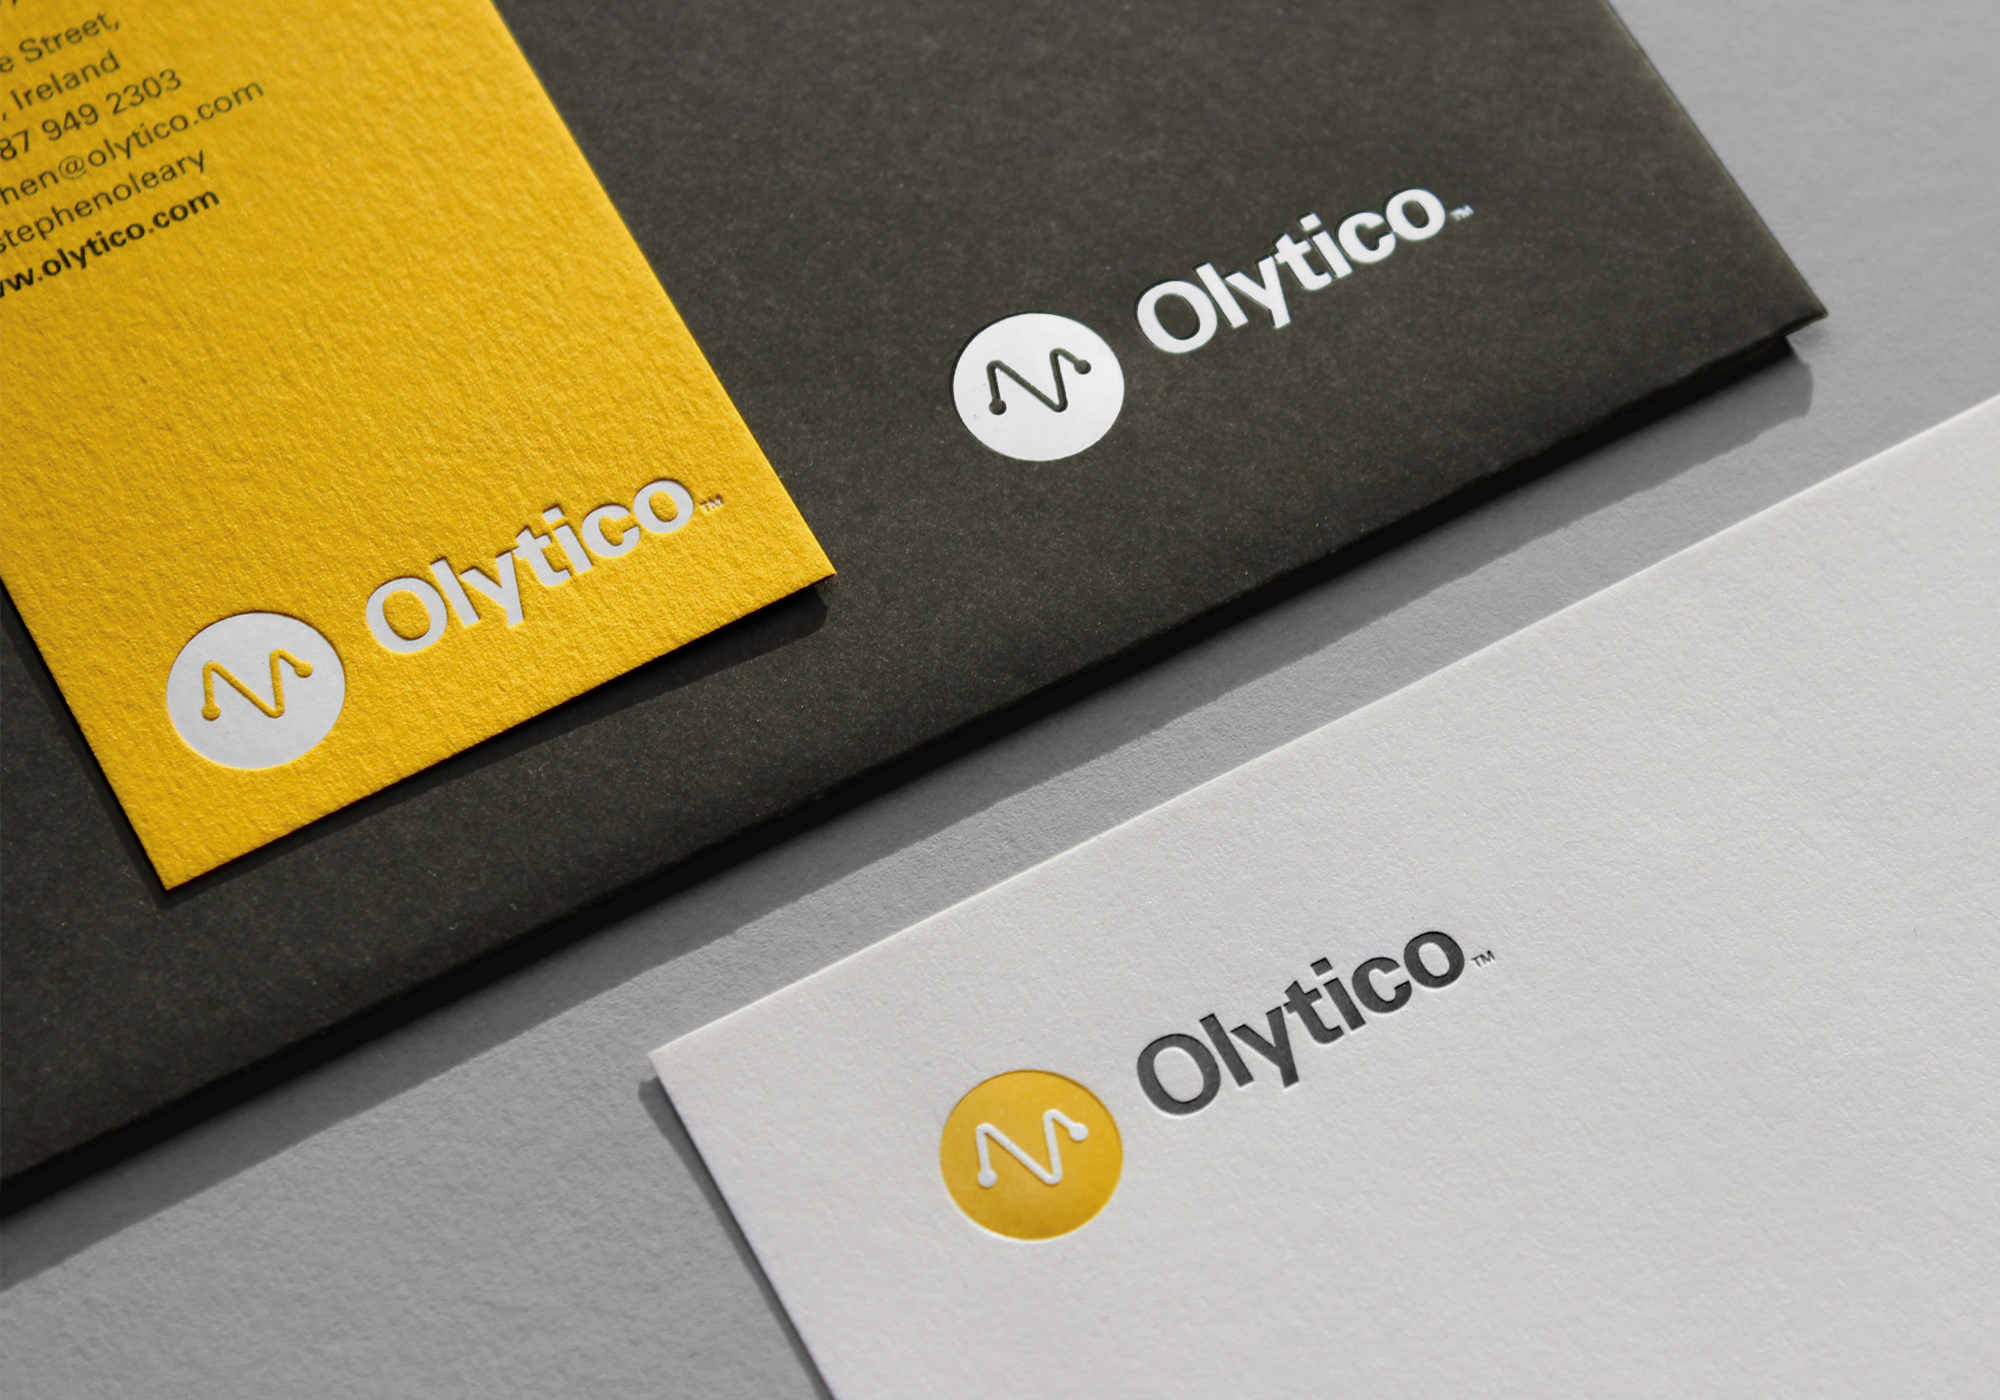 Cover image: Olytico